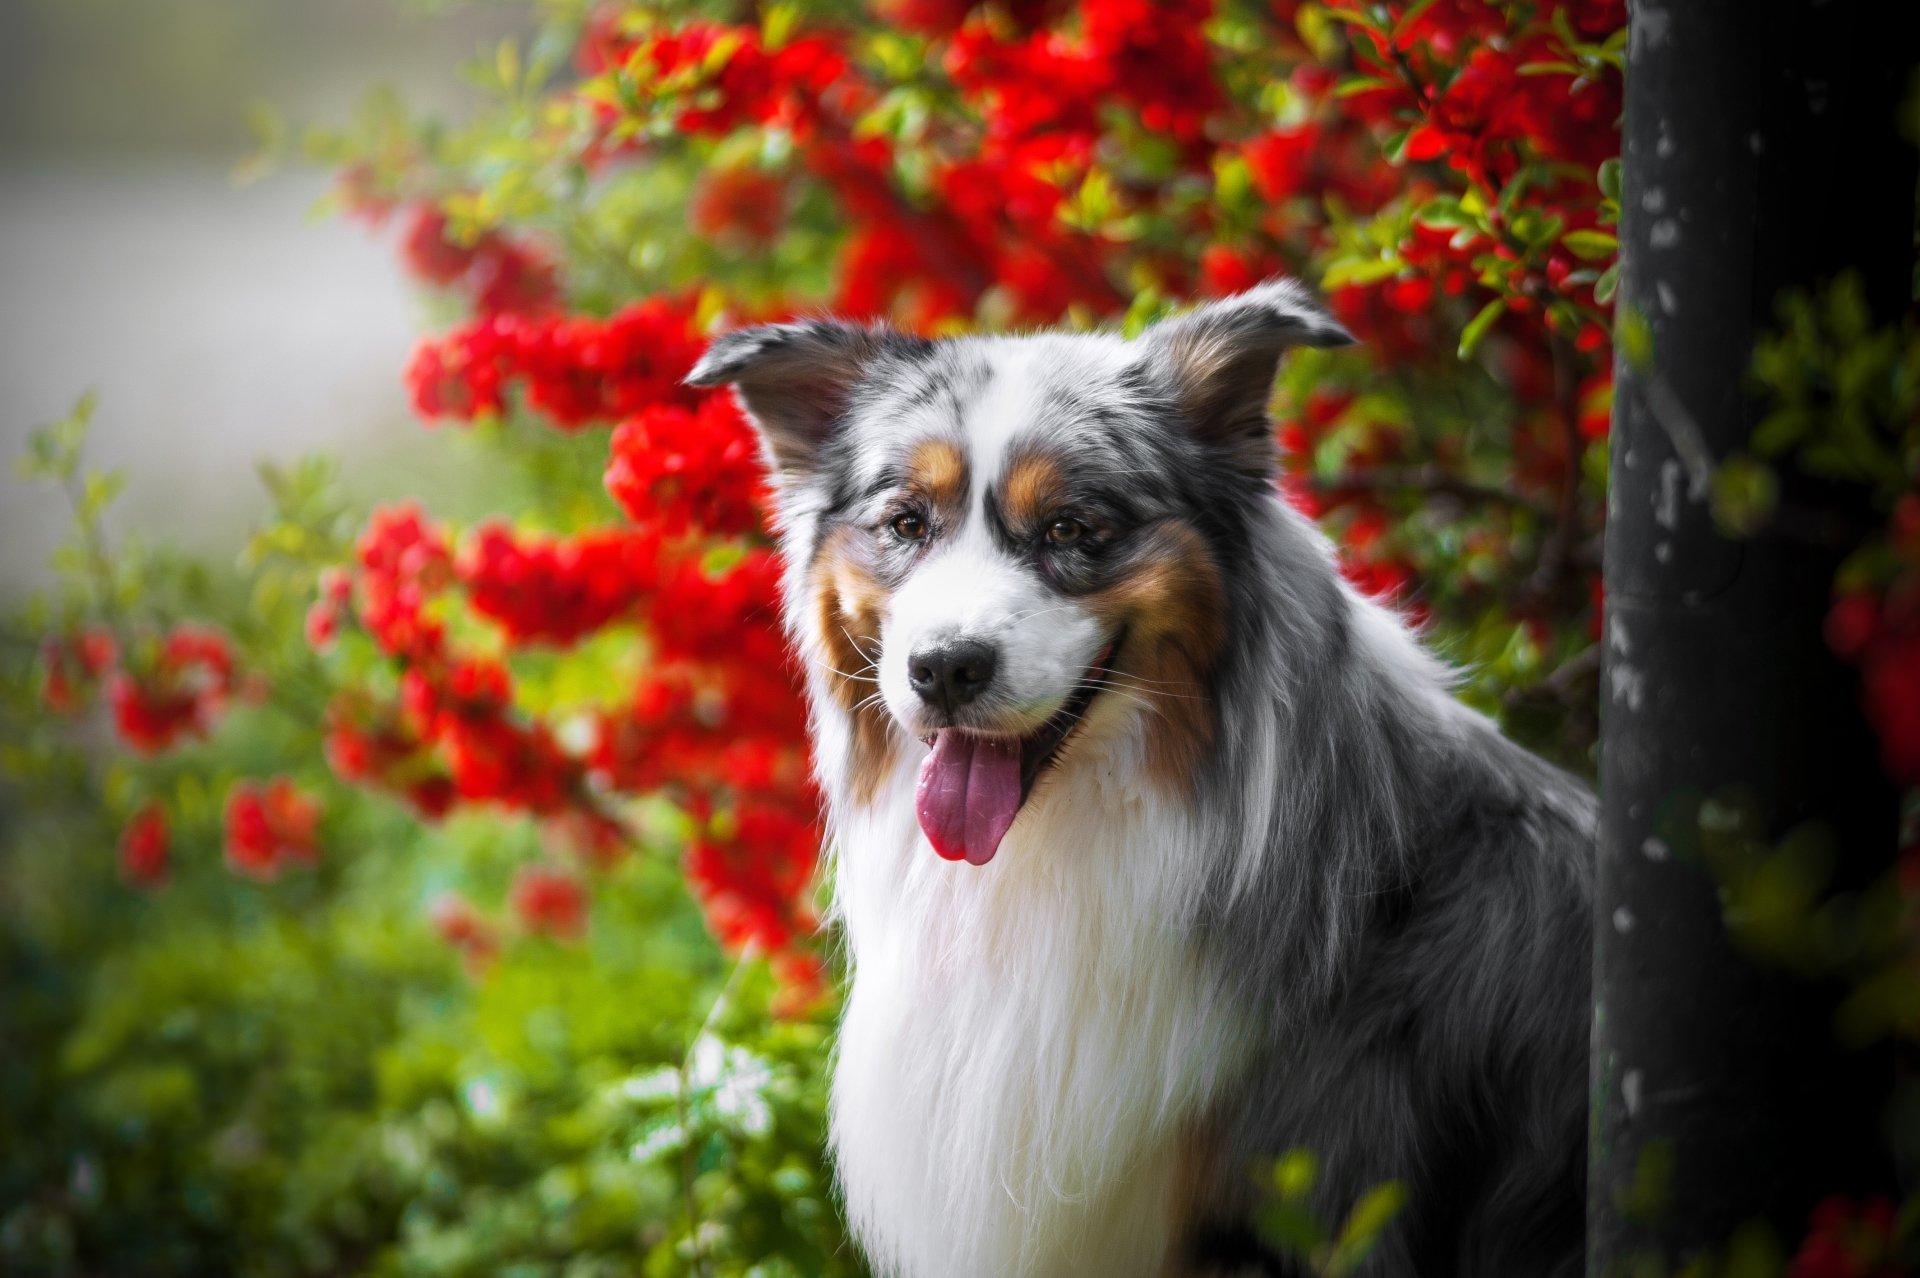 Animal - Australian Shepherd  Dog Pet Wallpaper